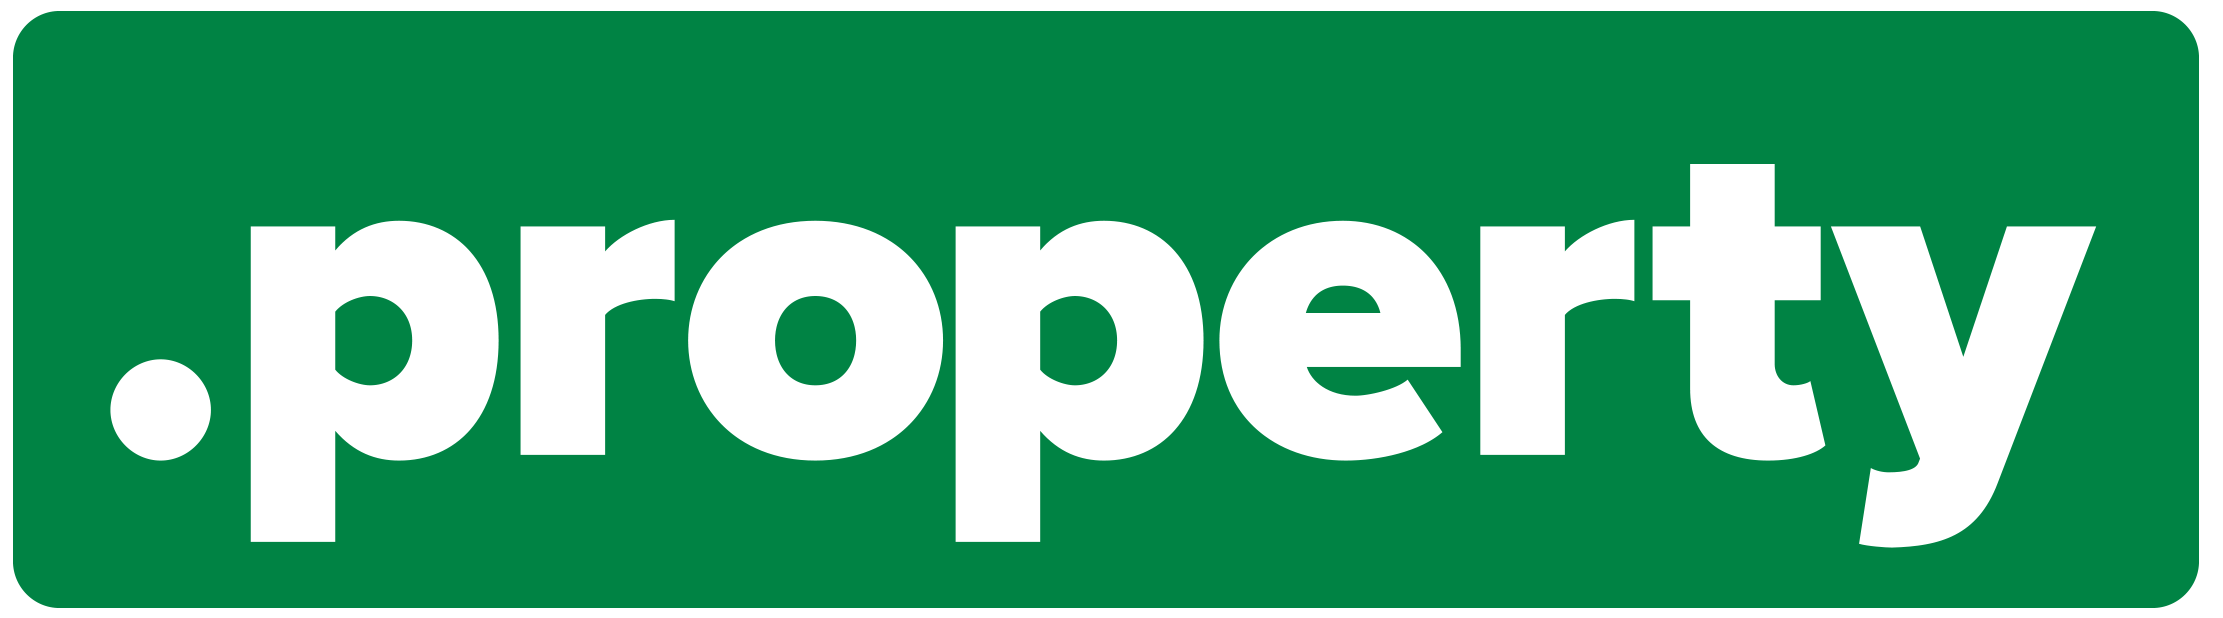 .PROPERTY TLD logo